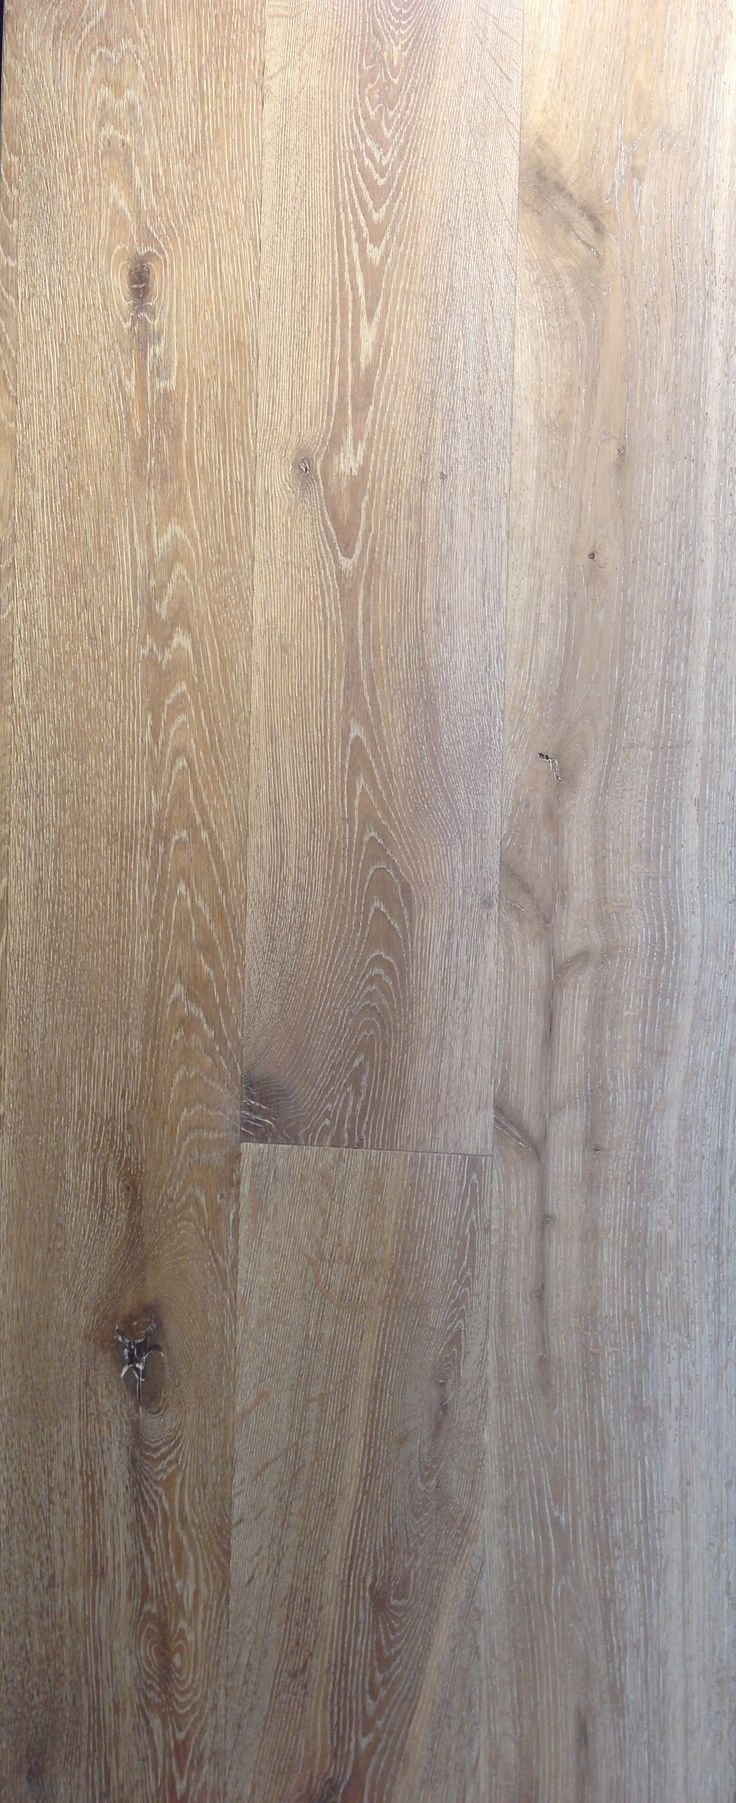 Flooring -- European white oak, wire brush scrubbed